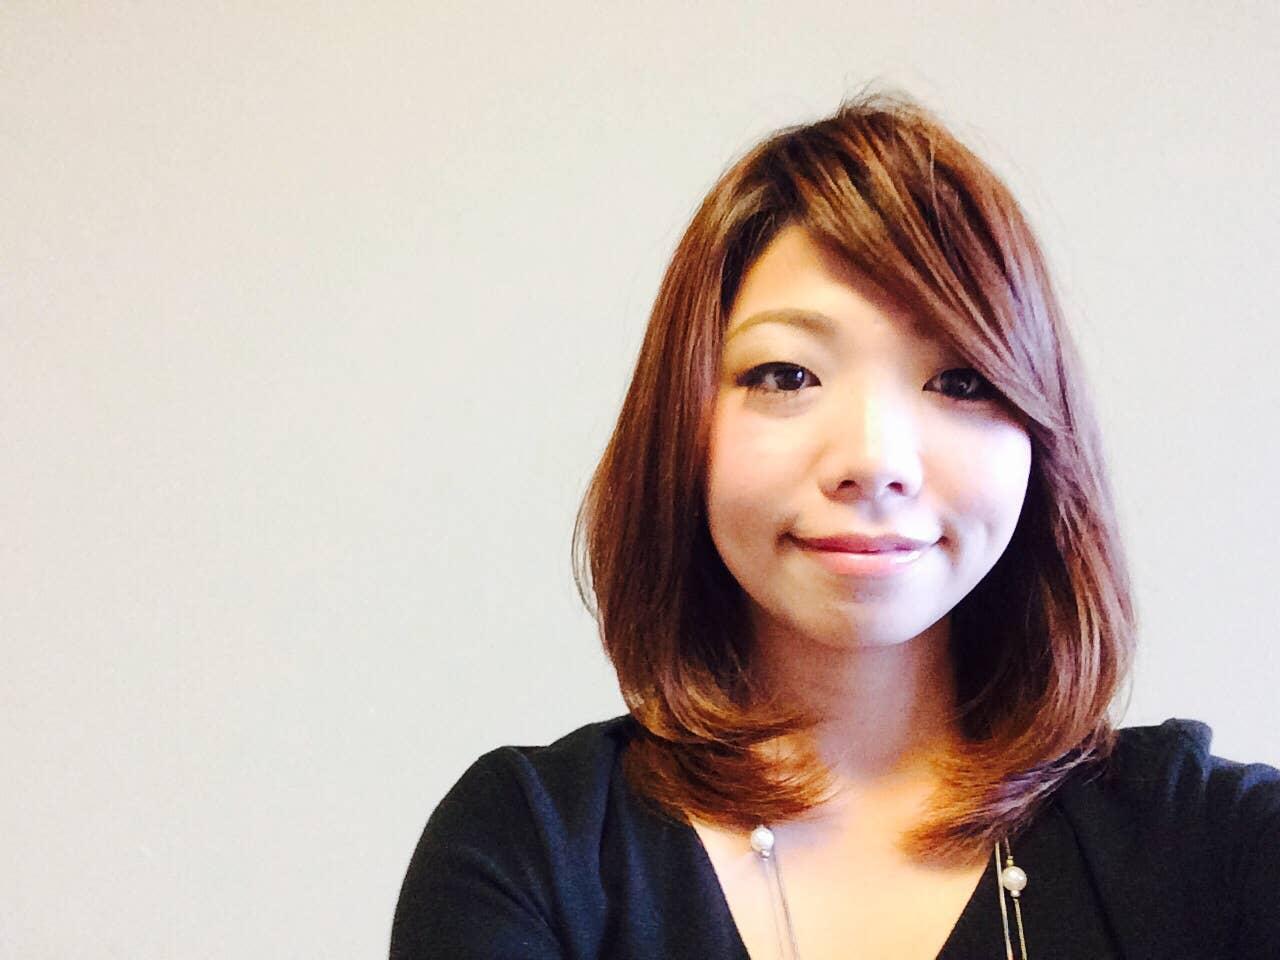 Yuriko Iwakuma